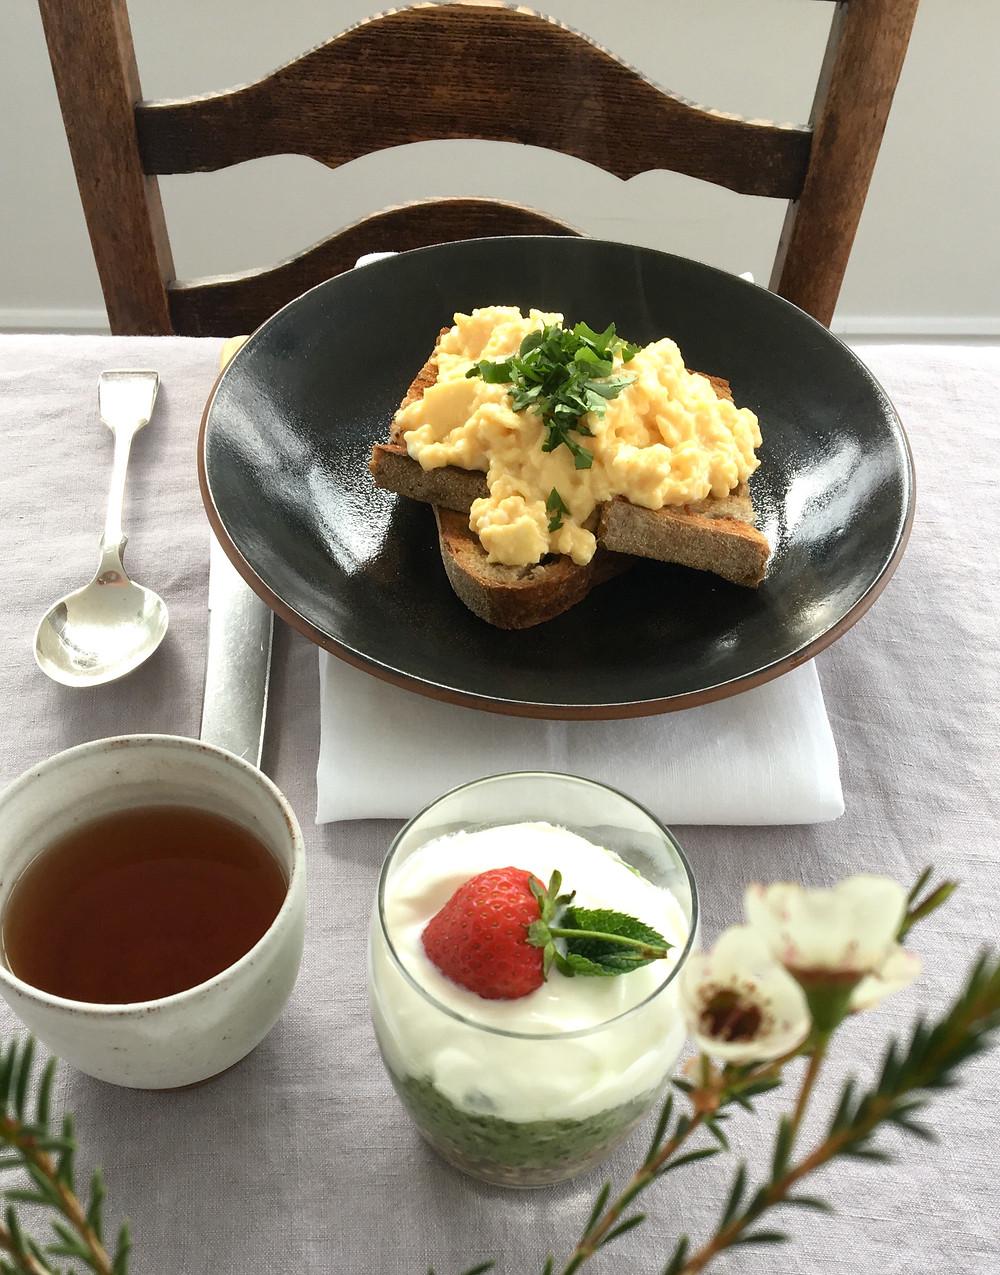 The Complete Retreat Wellbeing Retreat Breakfast